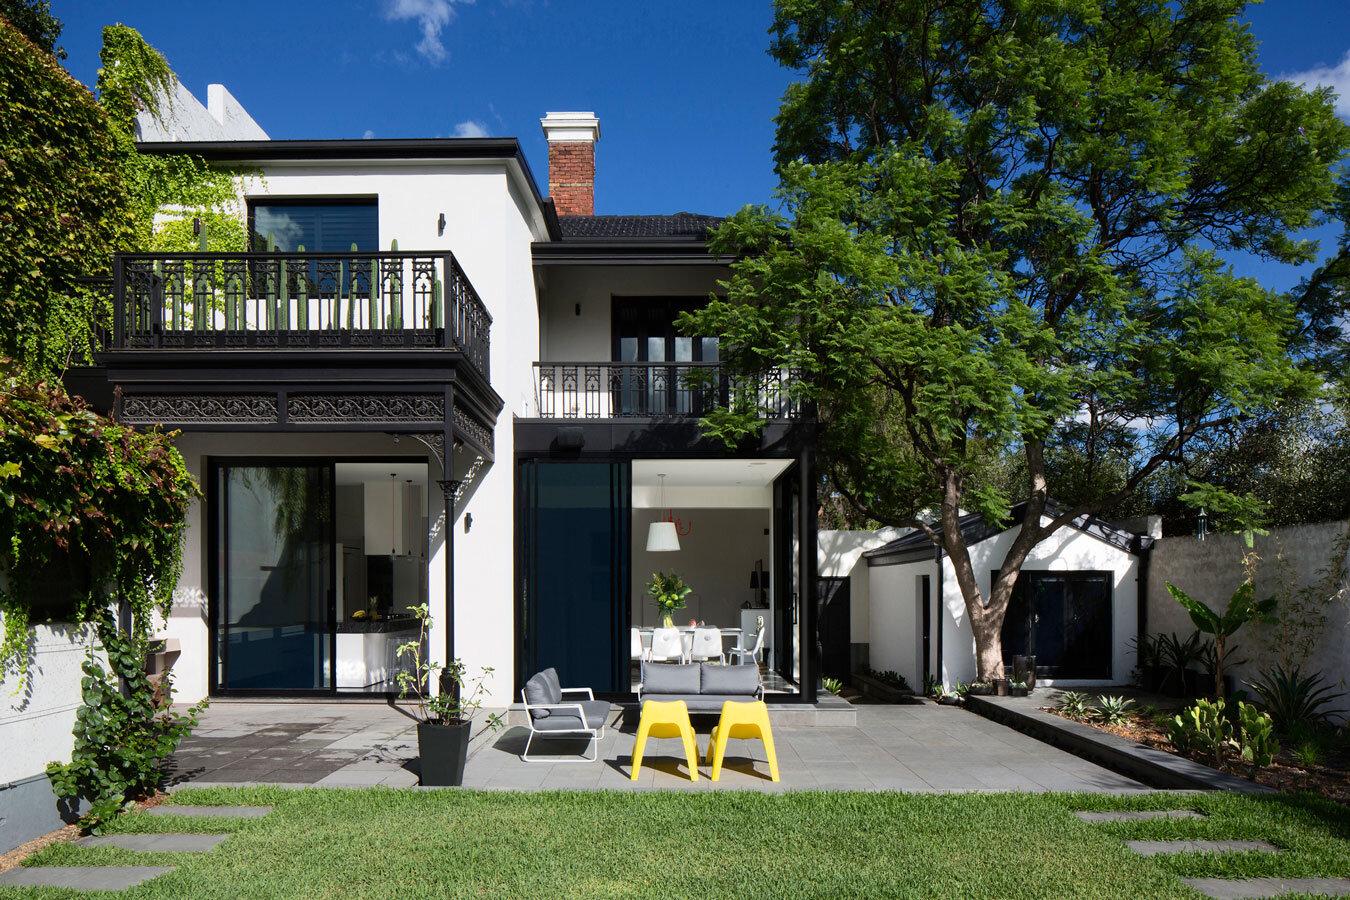 Victorian House With Contemporary Interior Design